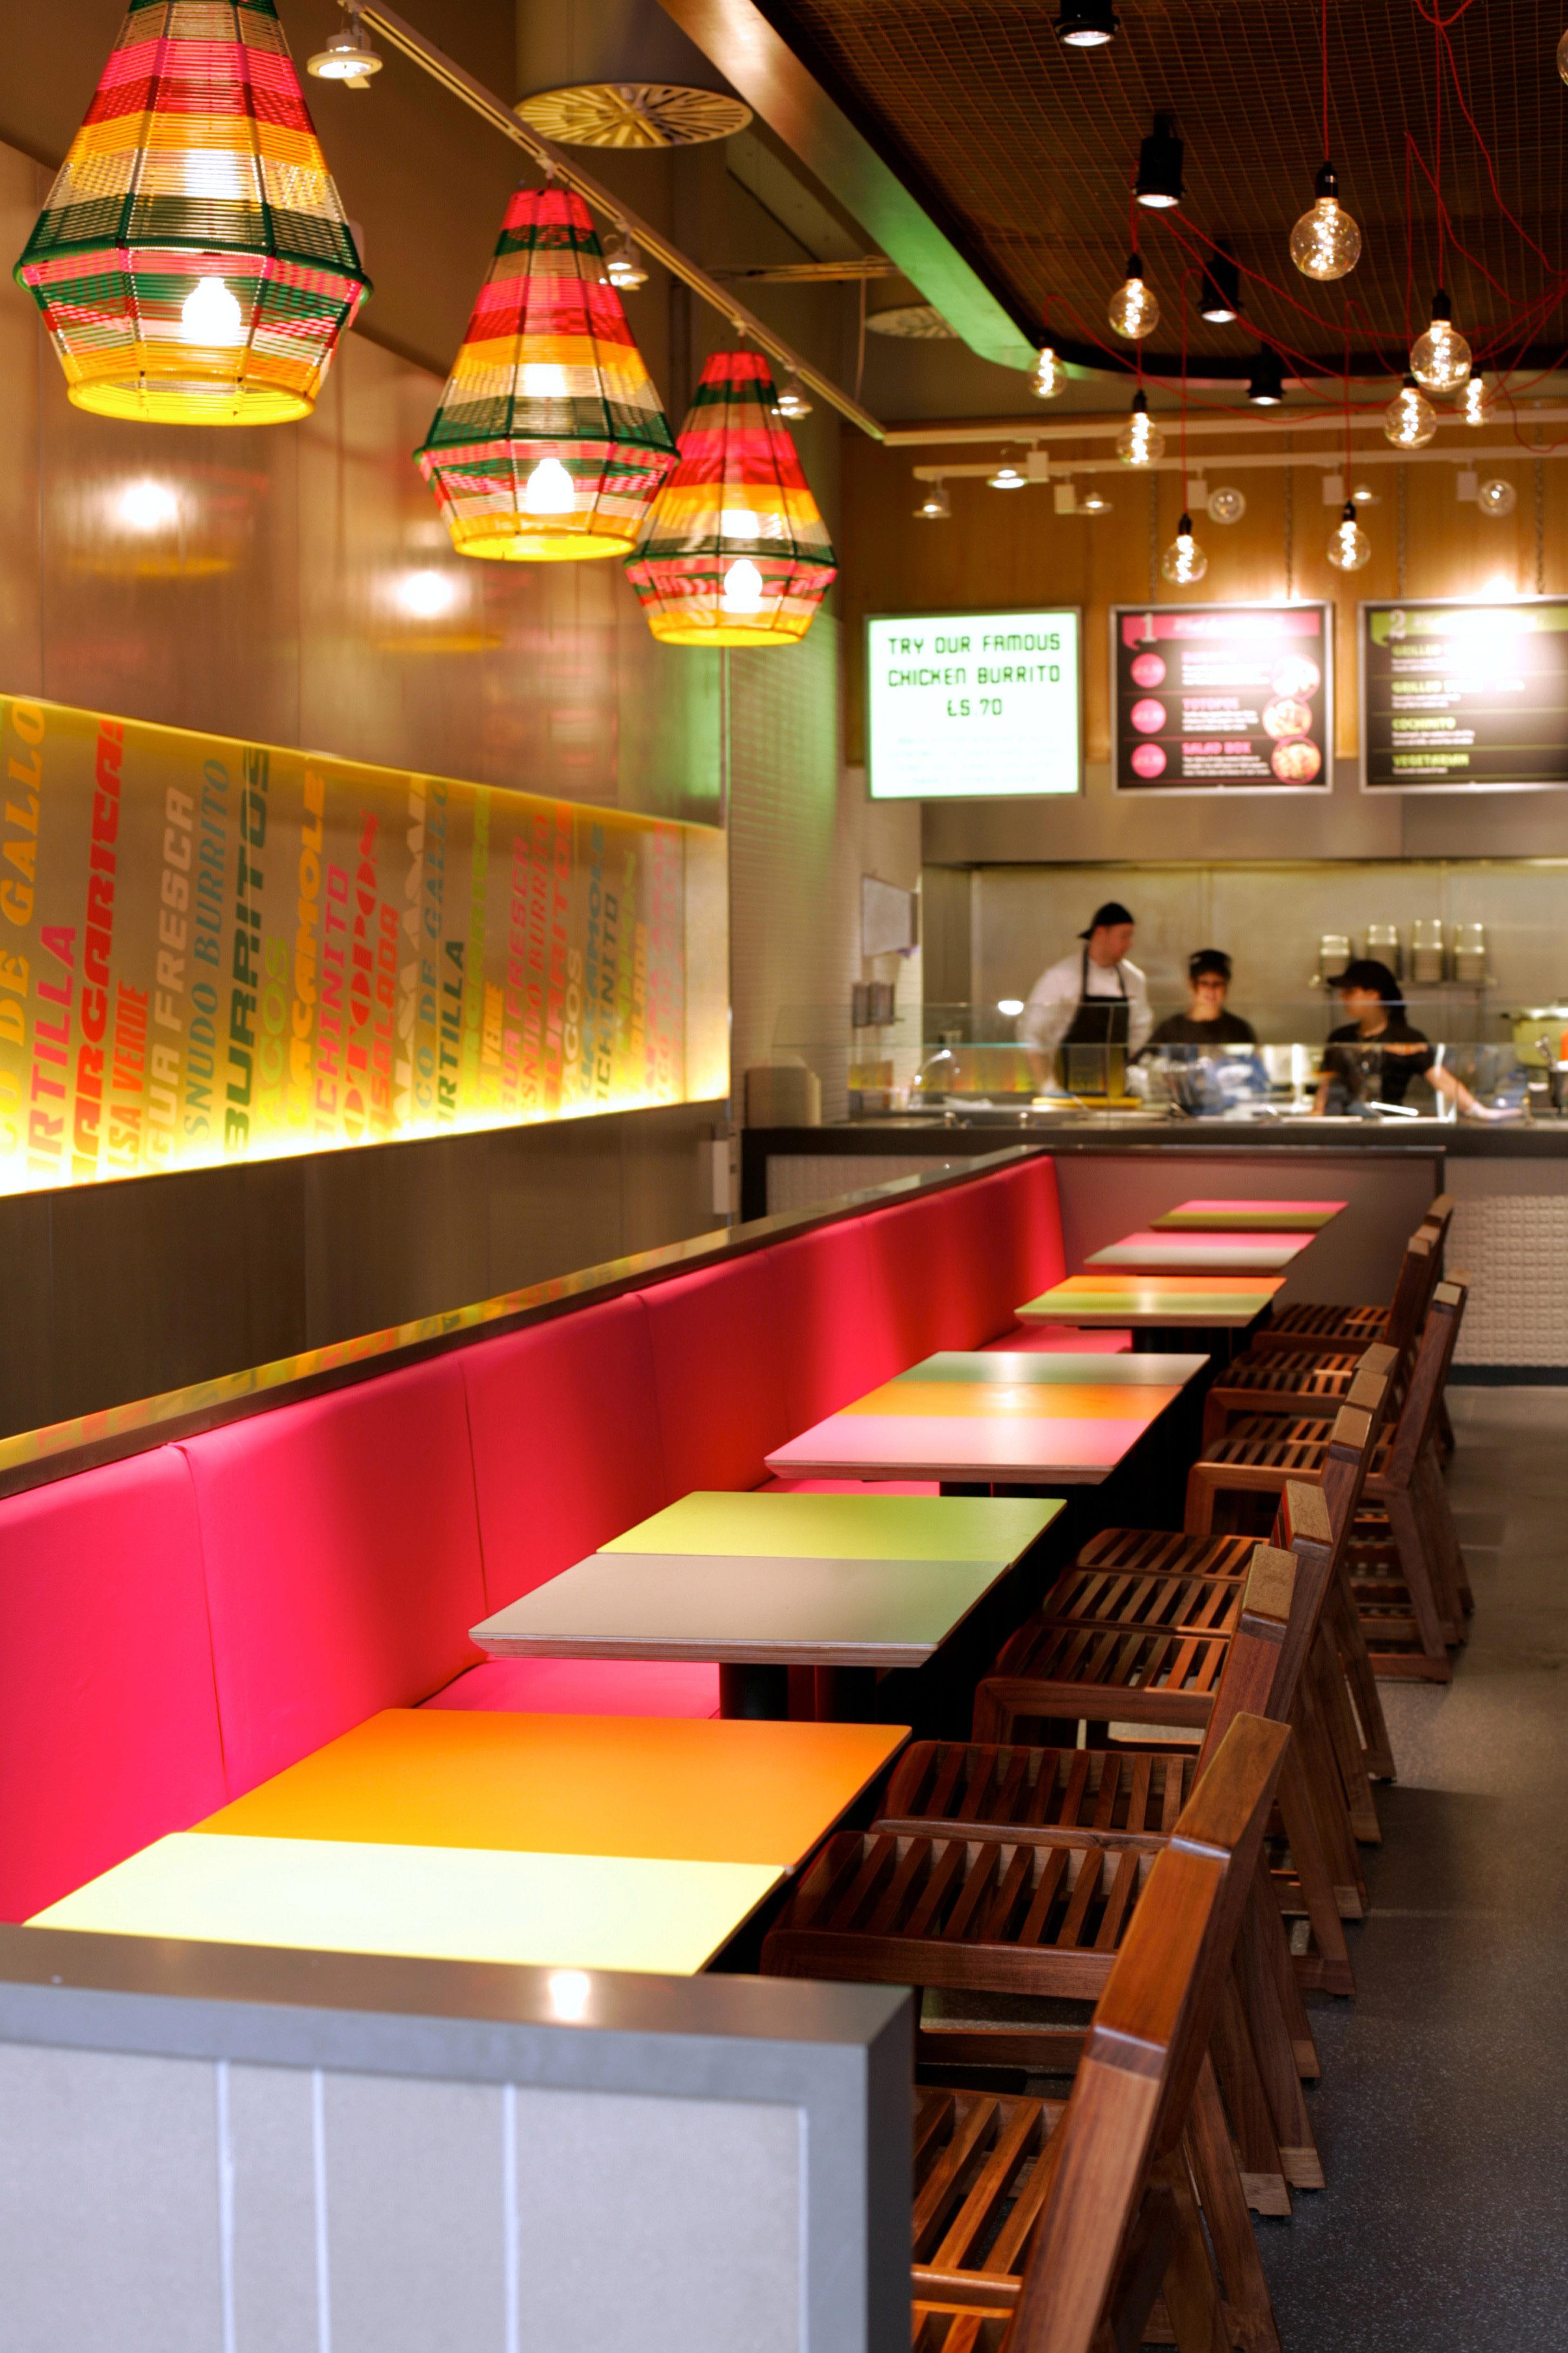 Restaurant bar design awards chilango kent